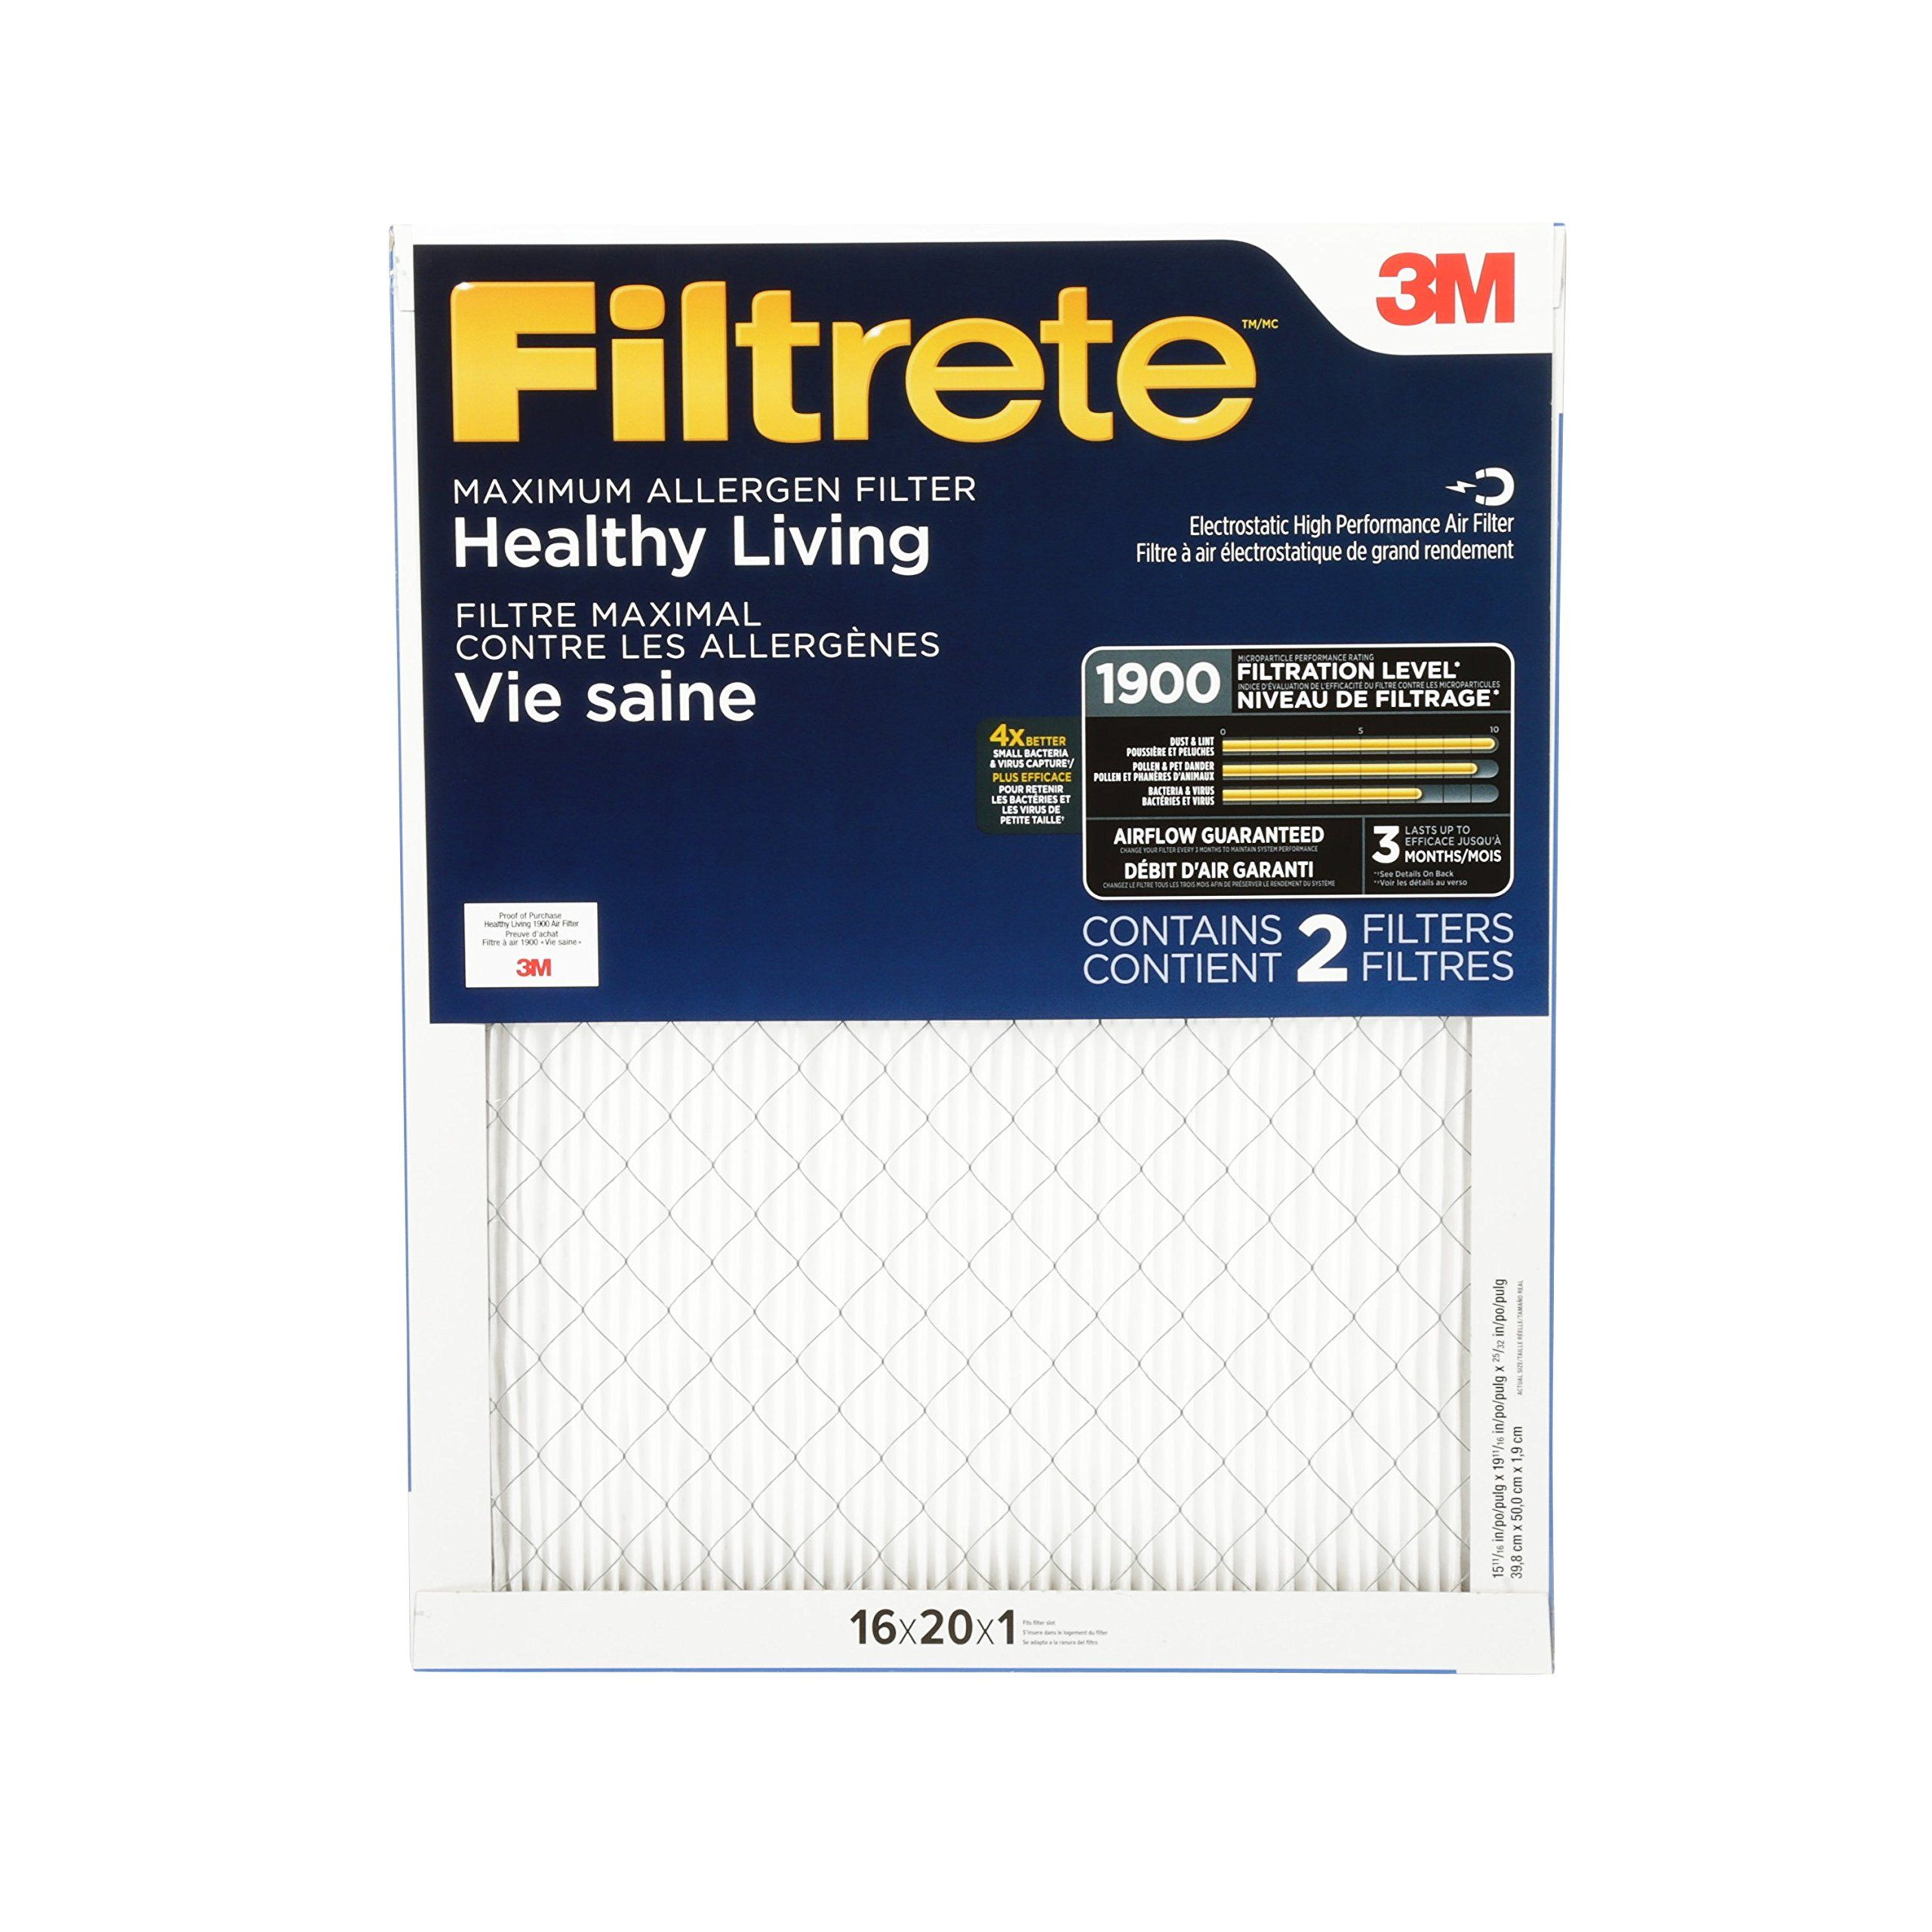 Filtrete Mpr 1900 16 X 20 X 1 Healthy Living Ultimate Allergen Reduction Hvac Air Filter 2pack Visit The Image Link More Deta Hvac Air Filters Healthy Living